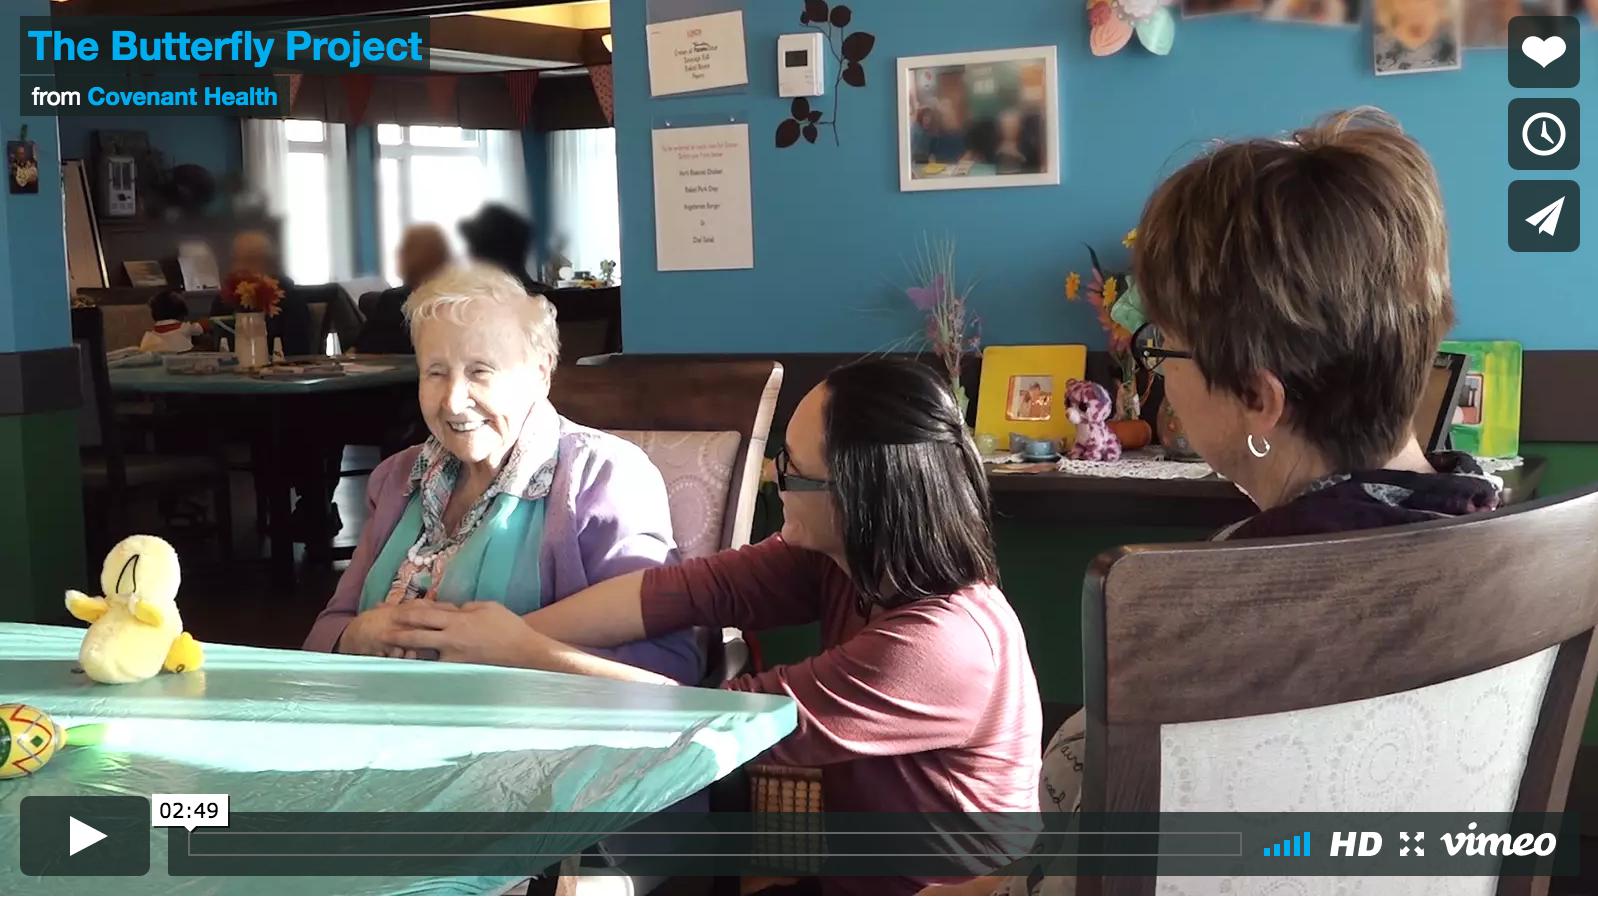 Covenant Health transforming dementia care